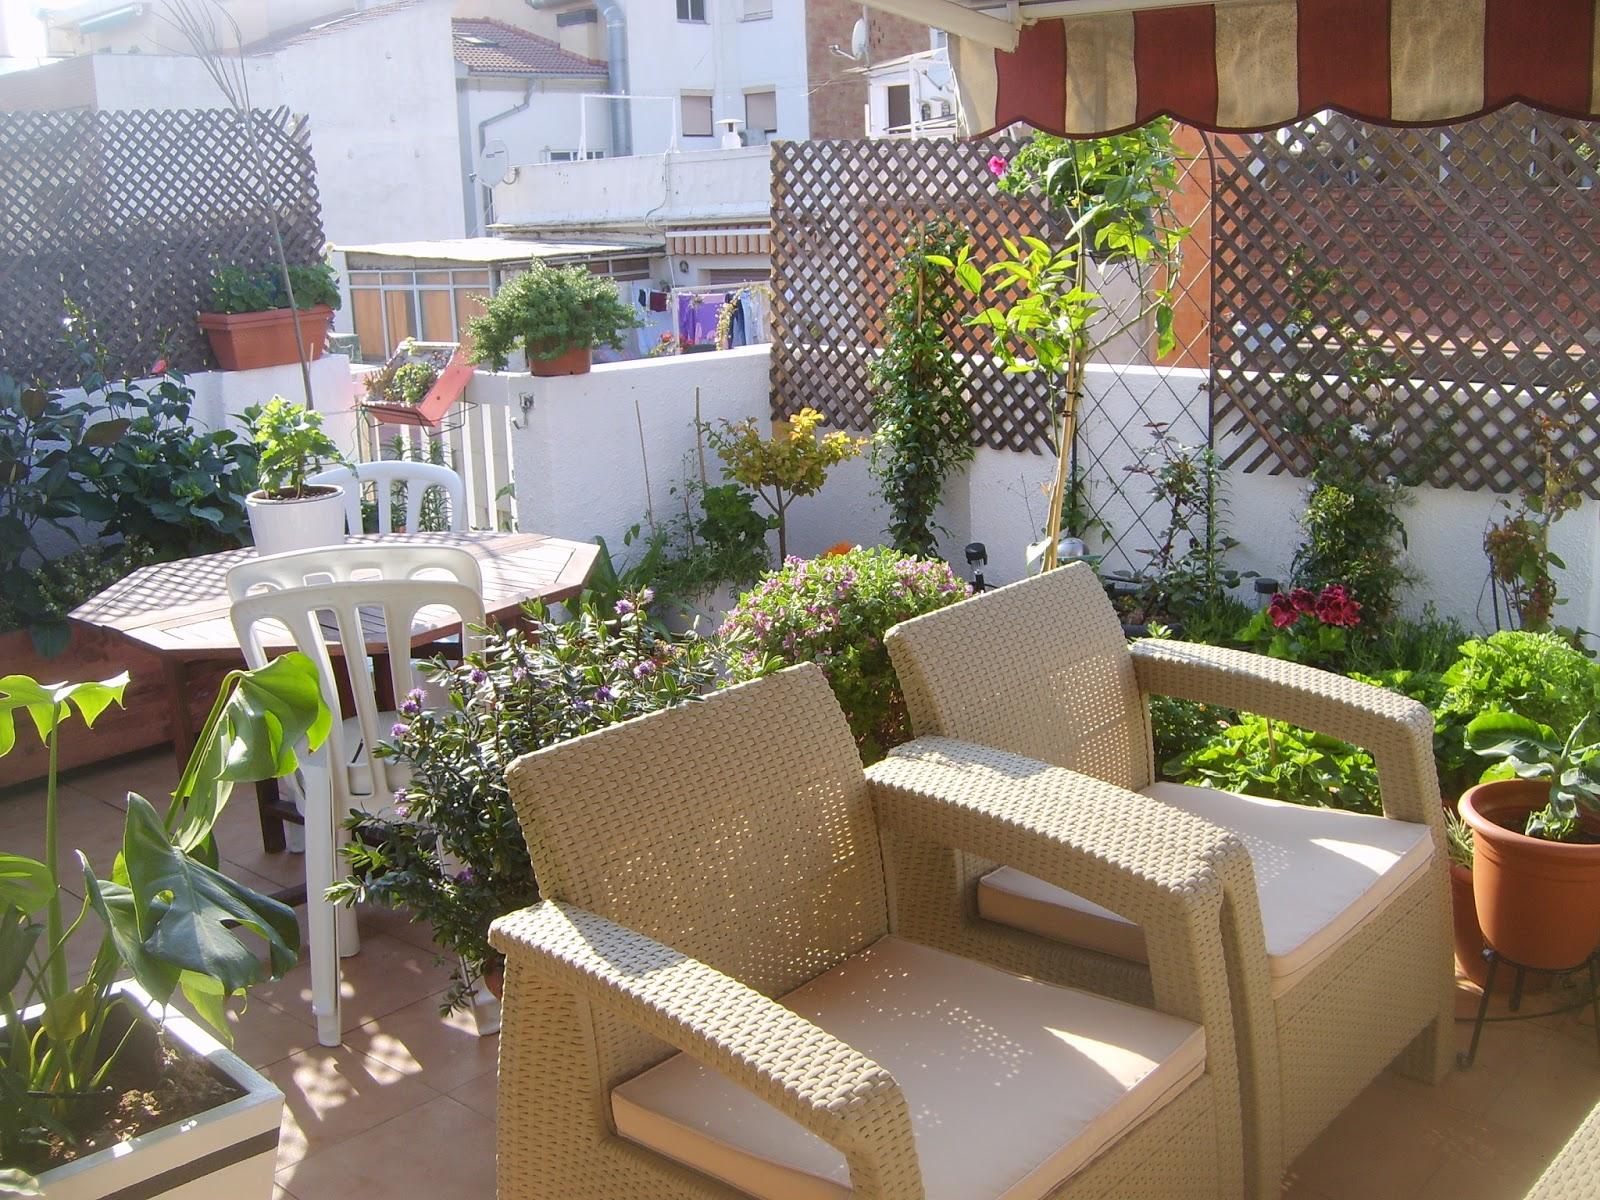 El rinc n de ceci un rincon relajante for Celosia terraza